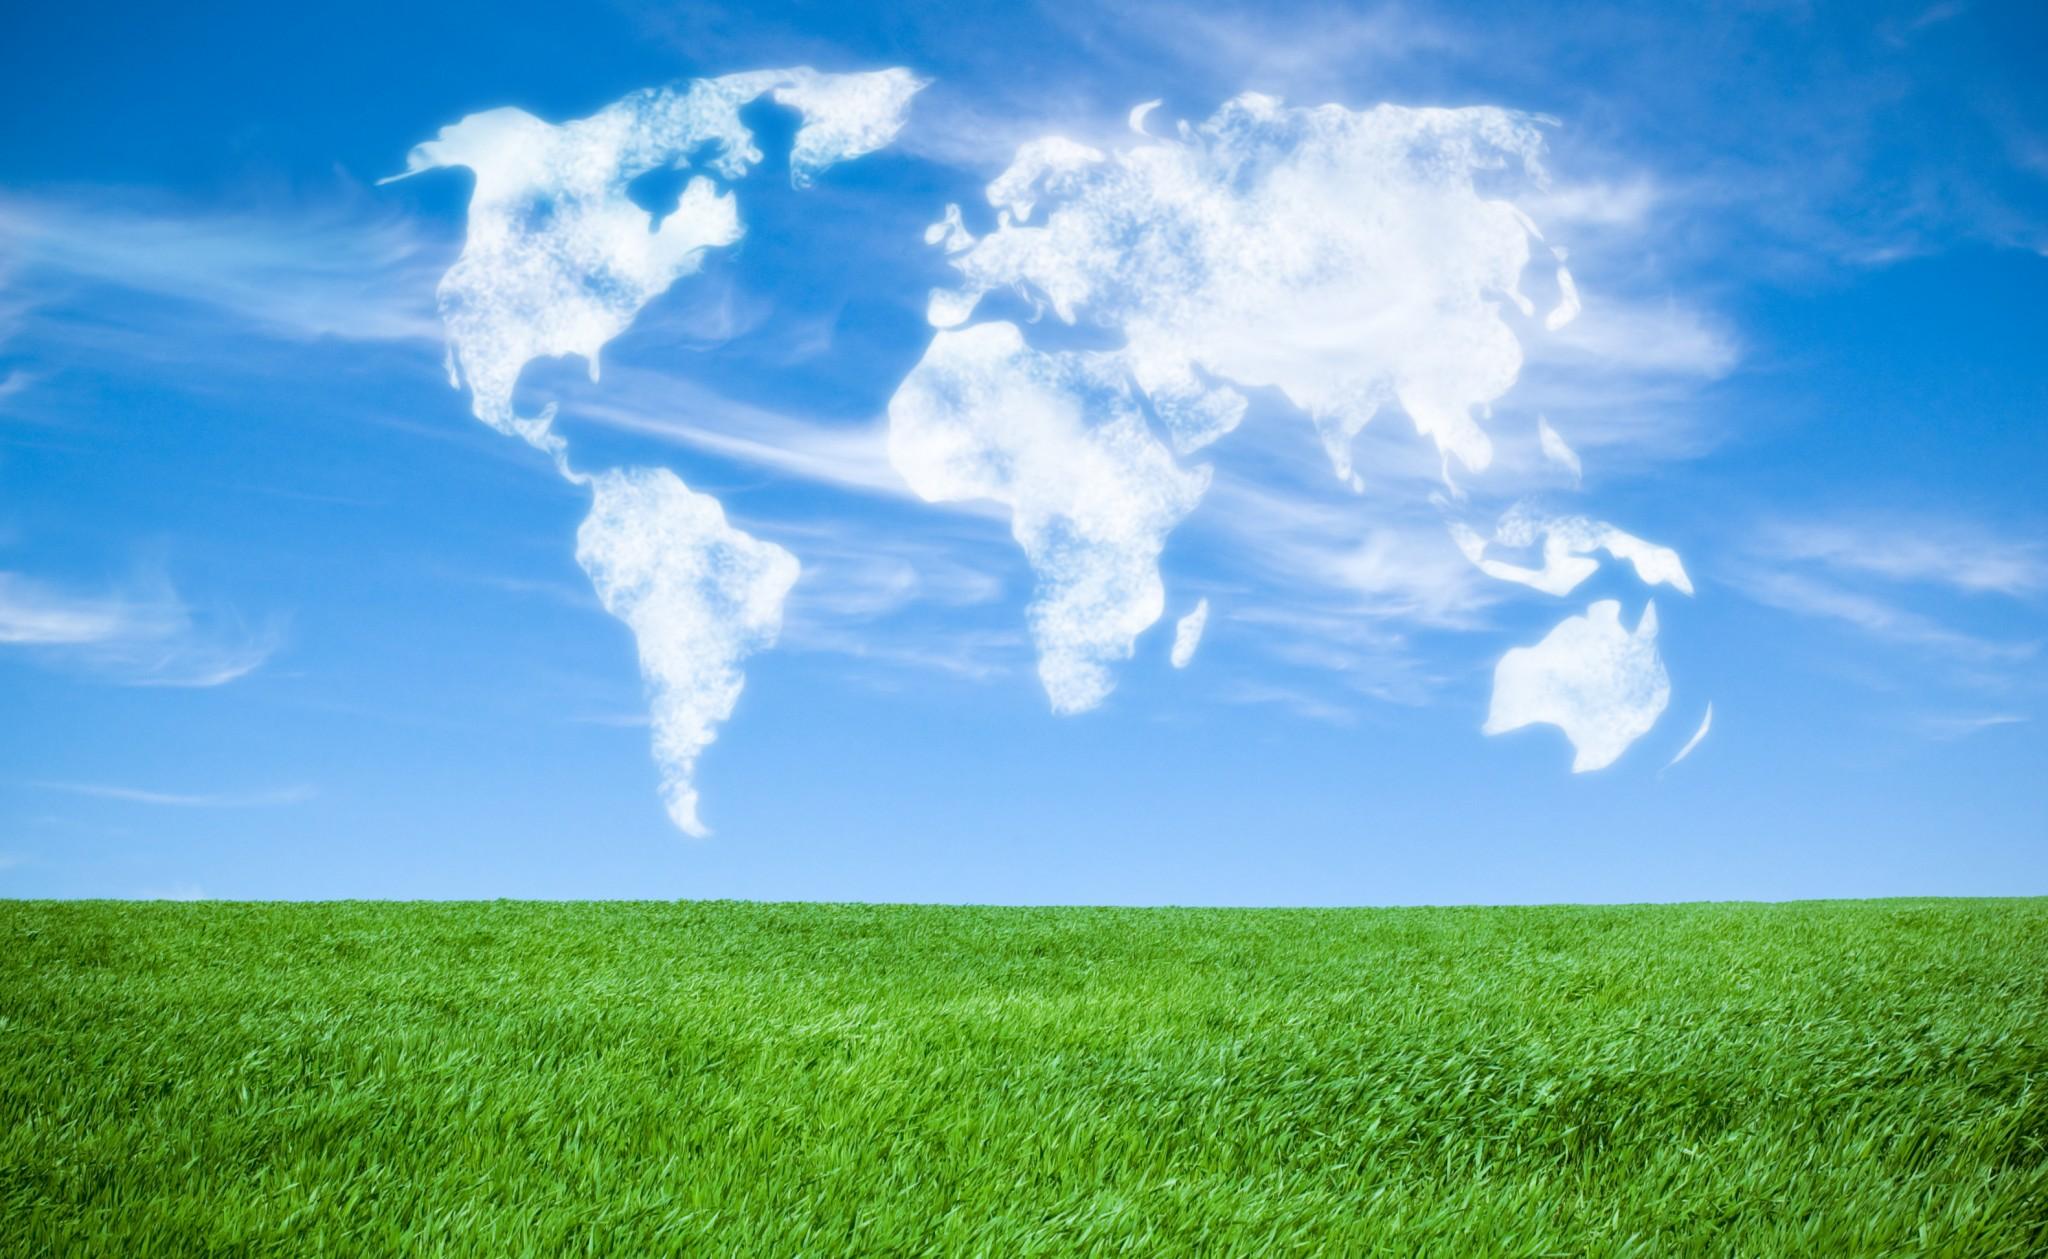 bigstock-world-map-shaped-by-clouds-18402251